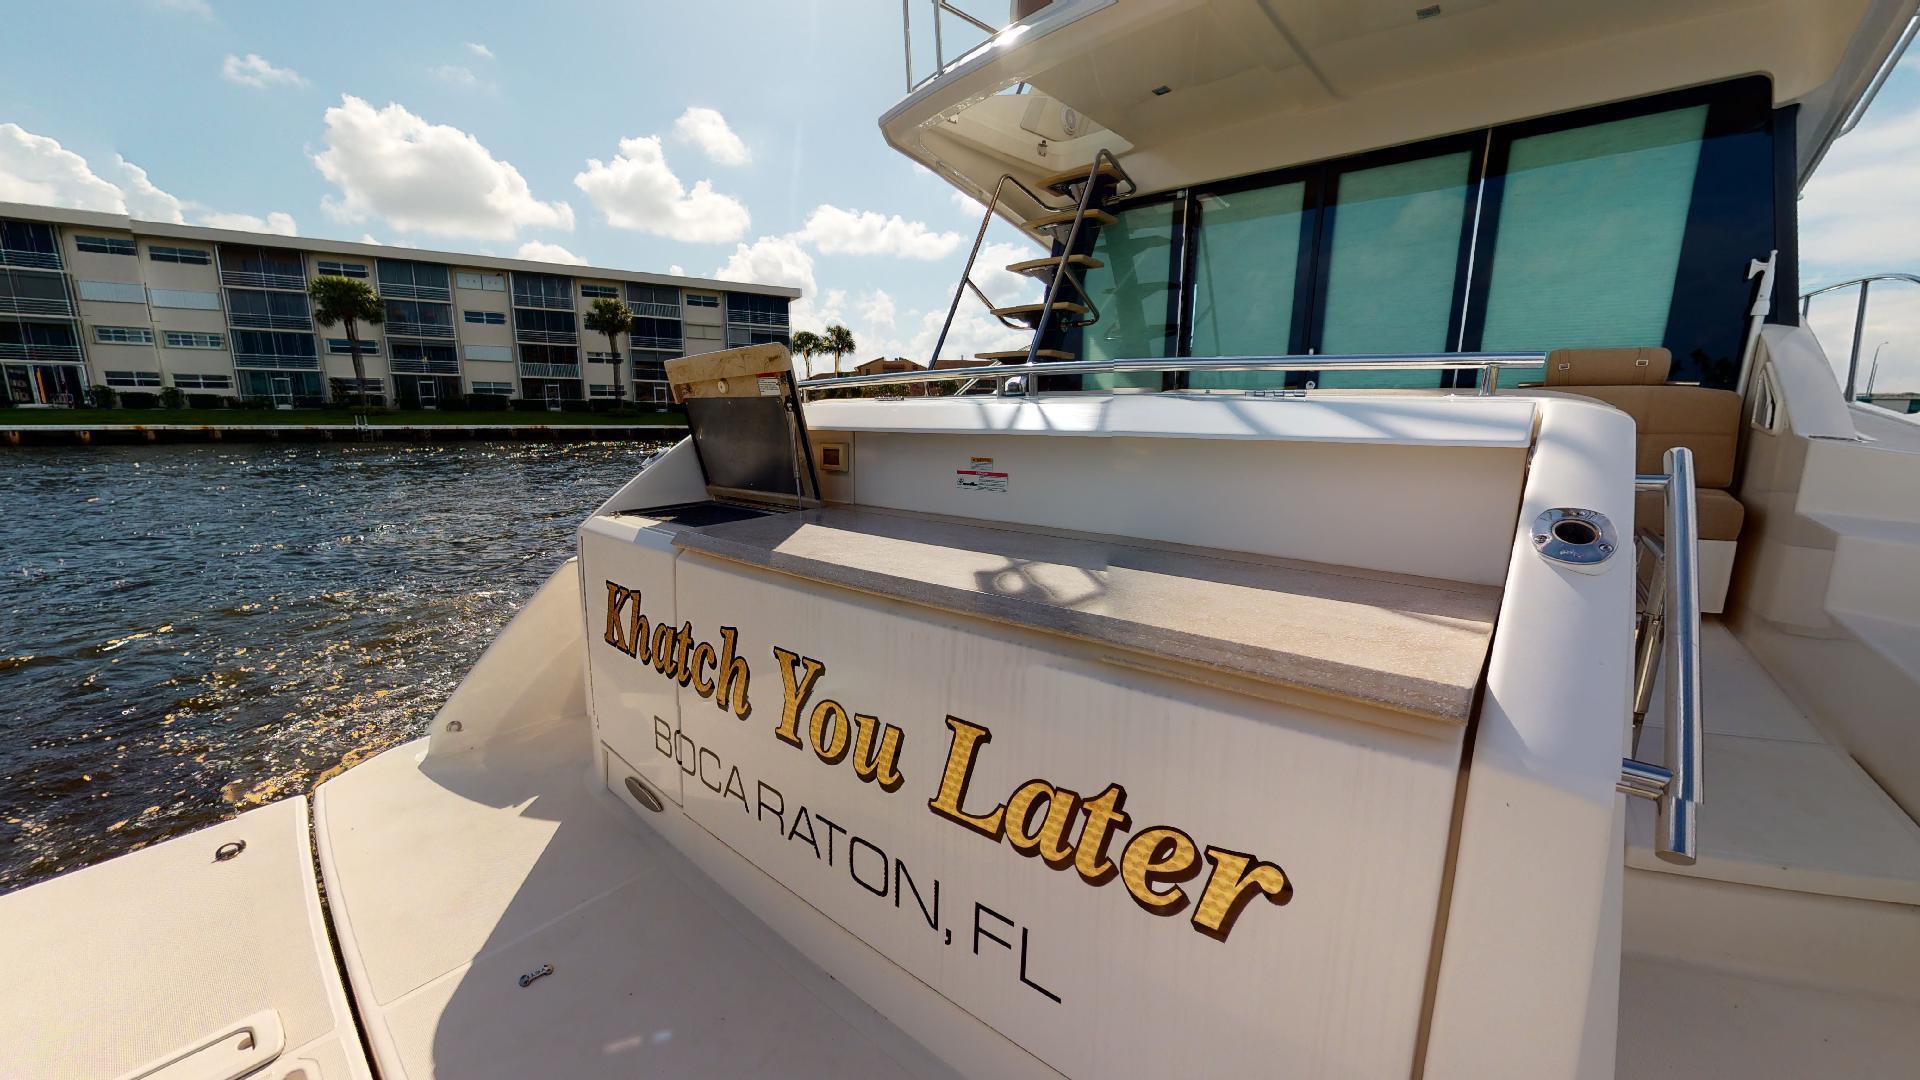 Tiara Yachts-50 Flybridge 2015-Khatch You Later North Palm Beach-Florida-United States-Transom-1509446 | Thumbnail